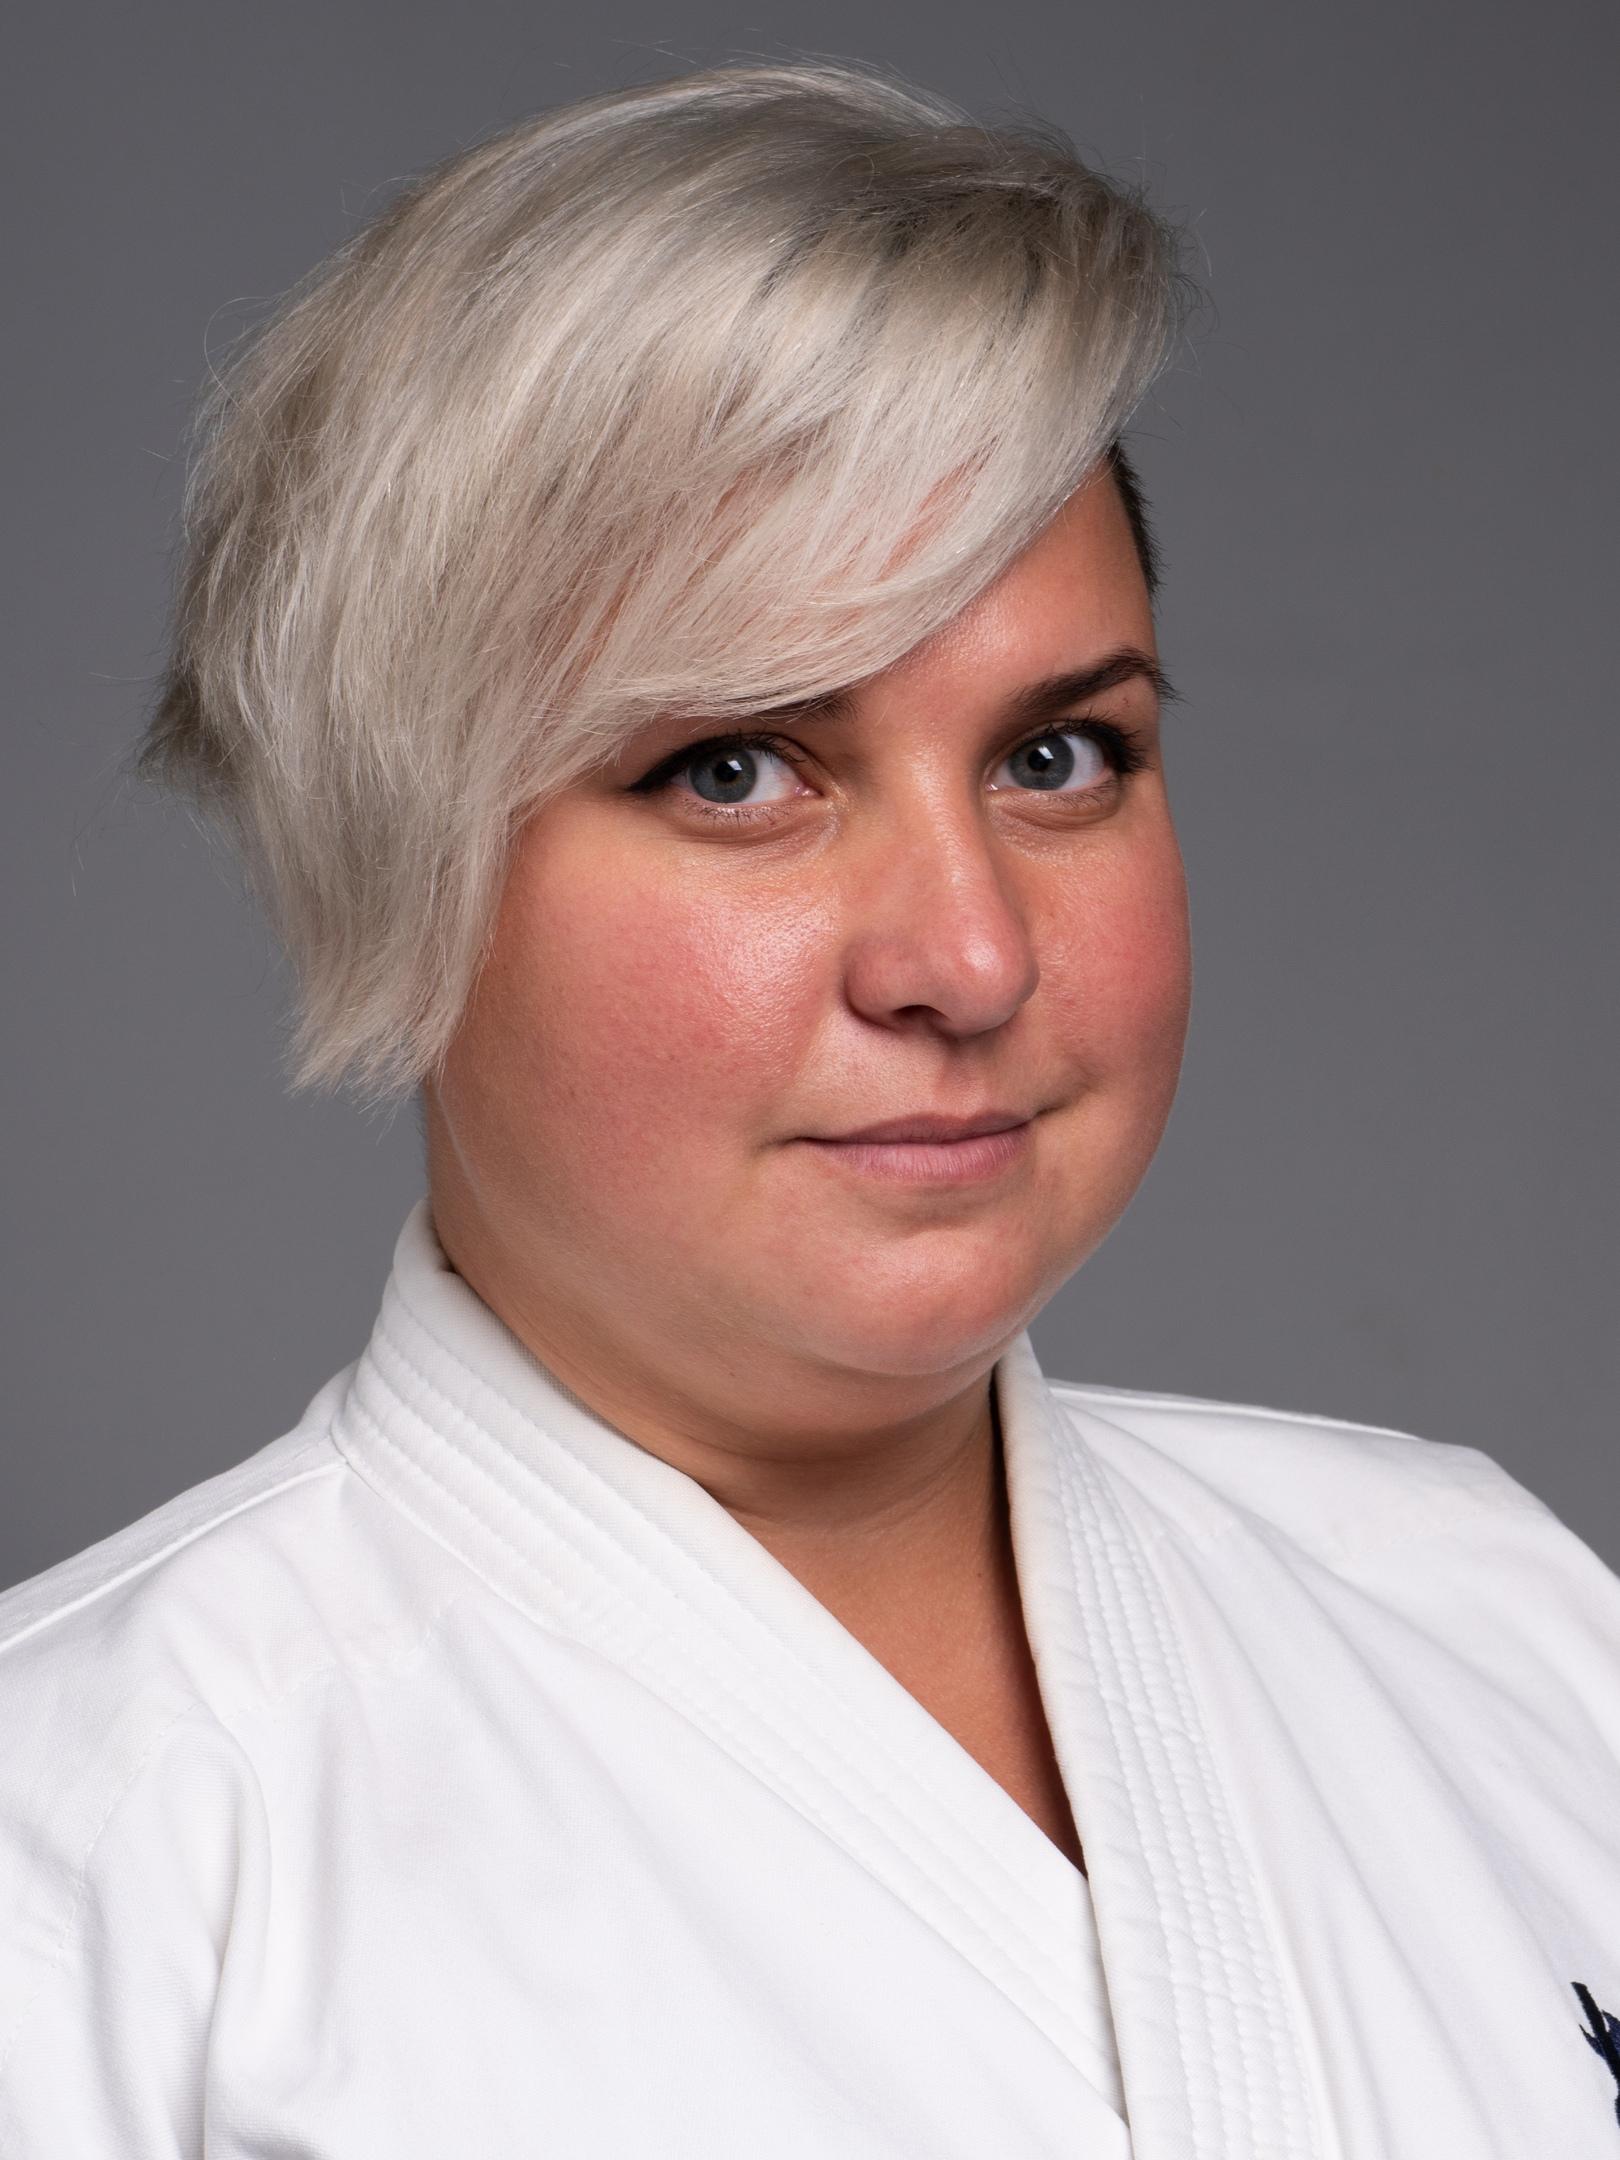 Васина Дарья Сергеевна